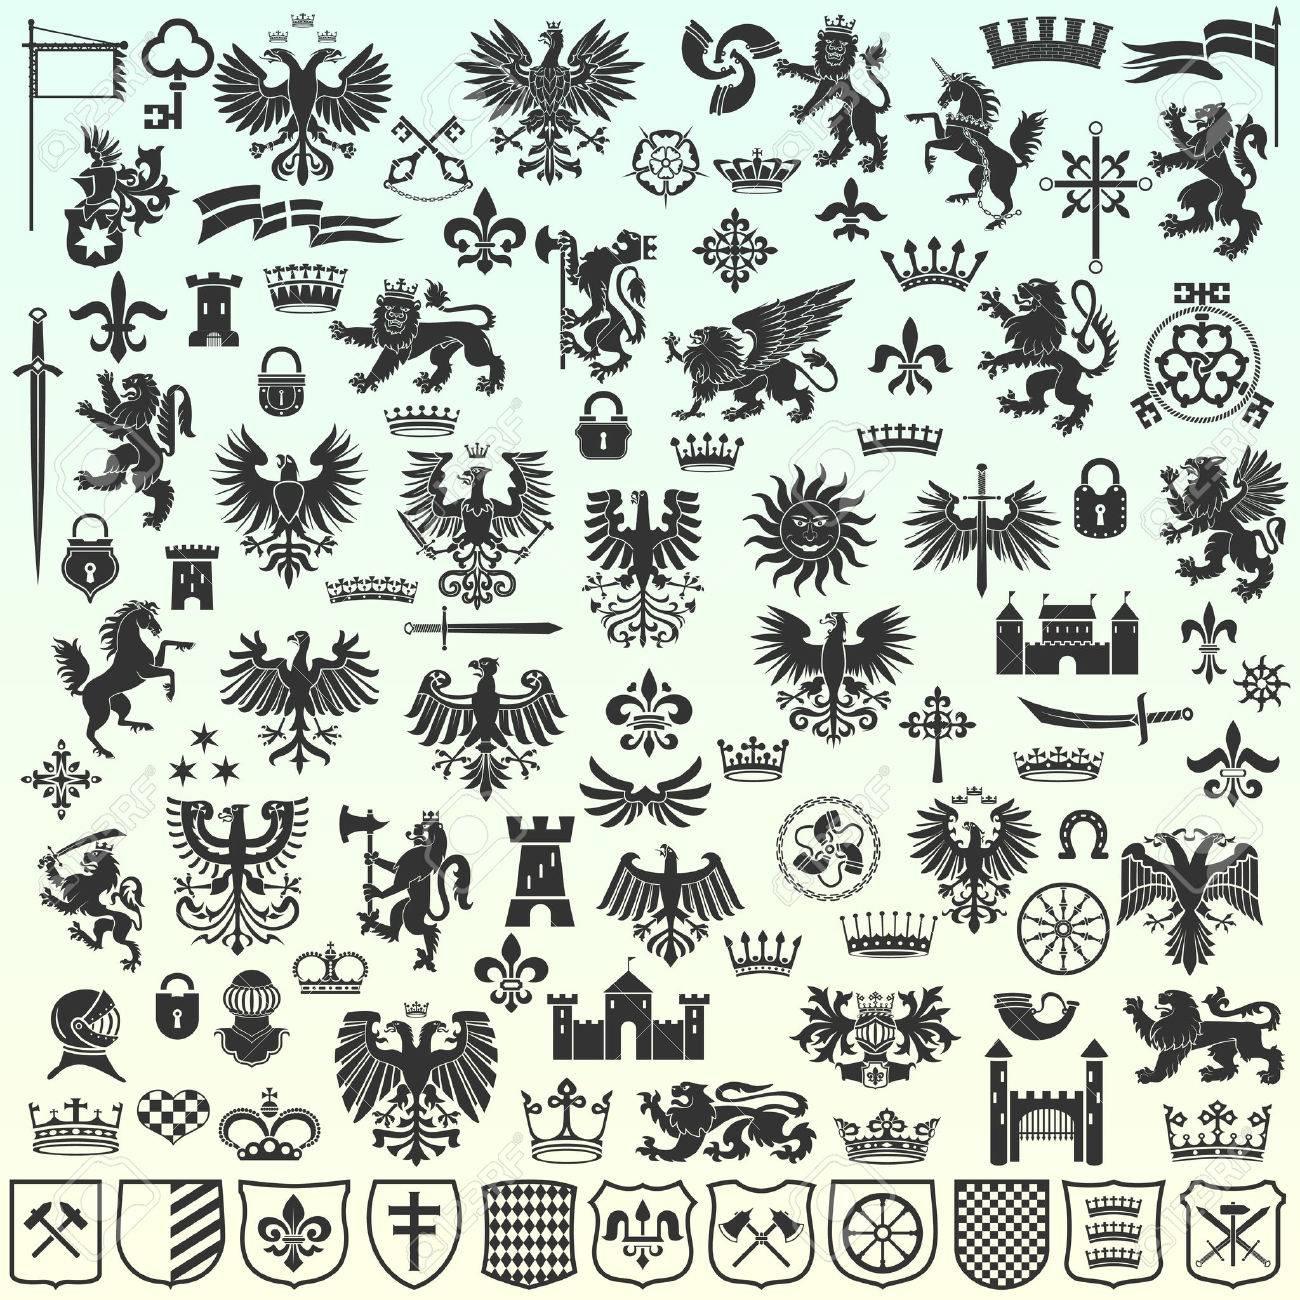 Silhouettes Of Heraldic Design Elements - 50874811